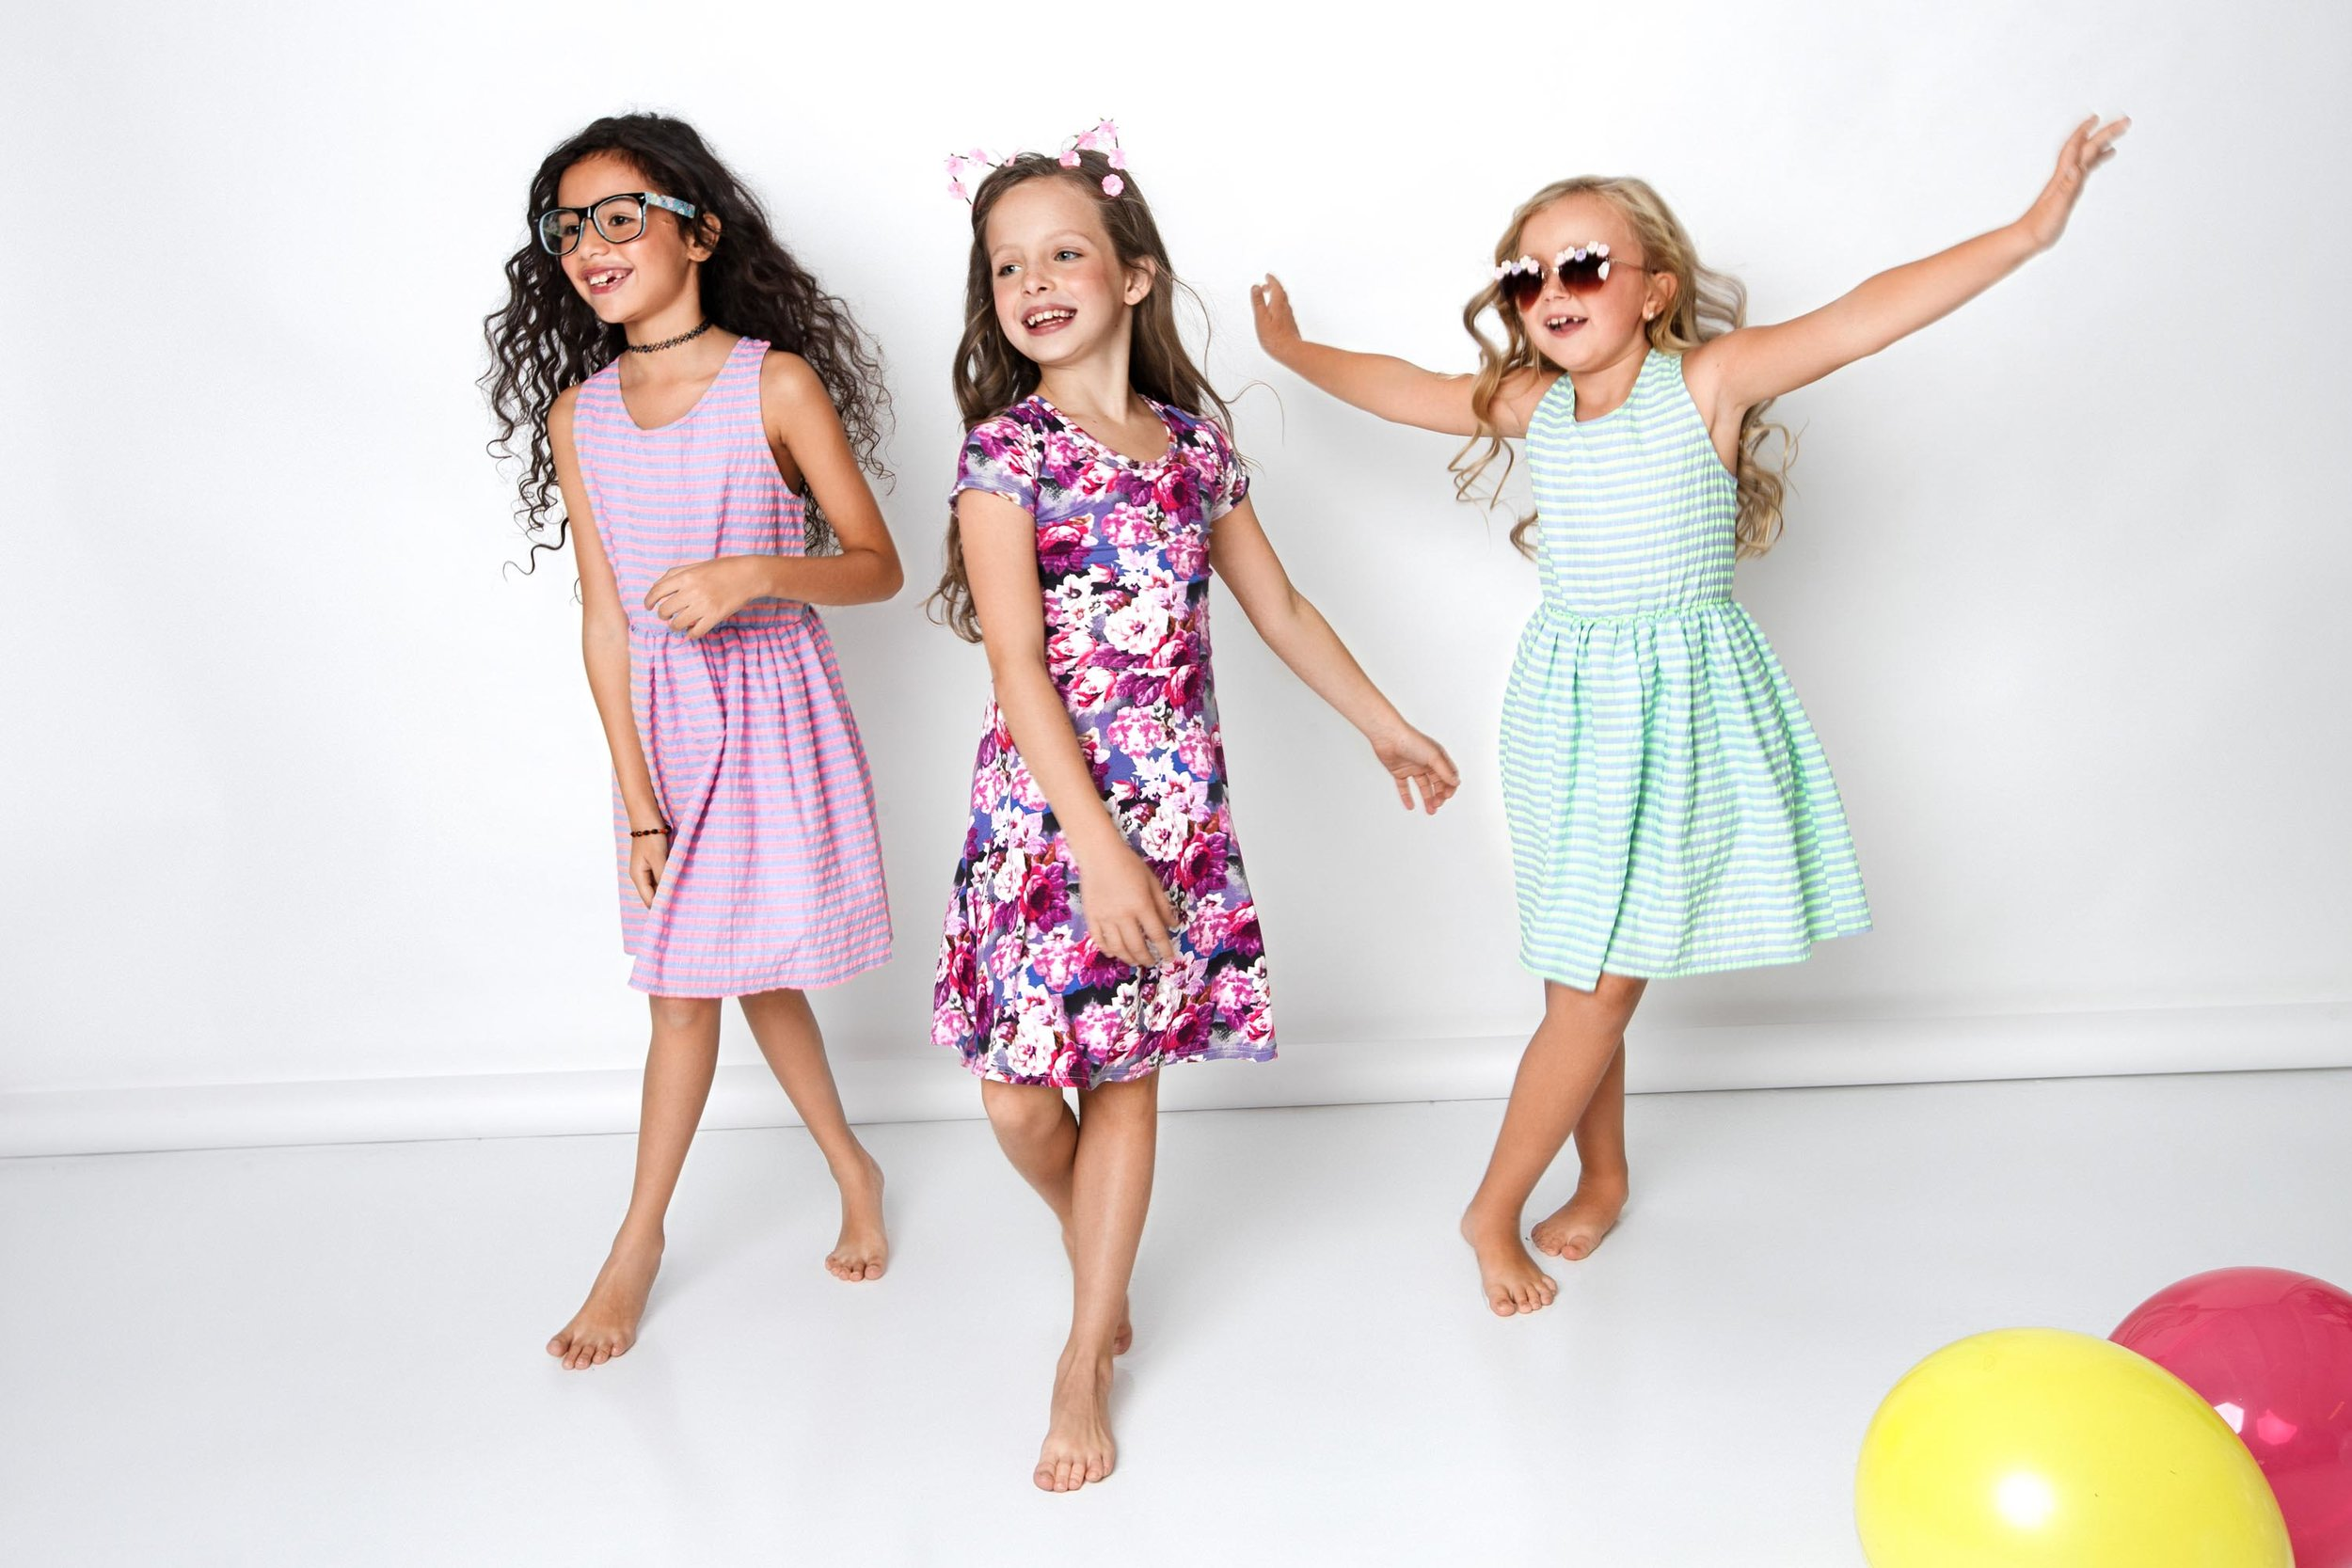 nyc-photographers-kids-modeling-10007.jpg